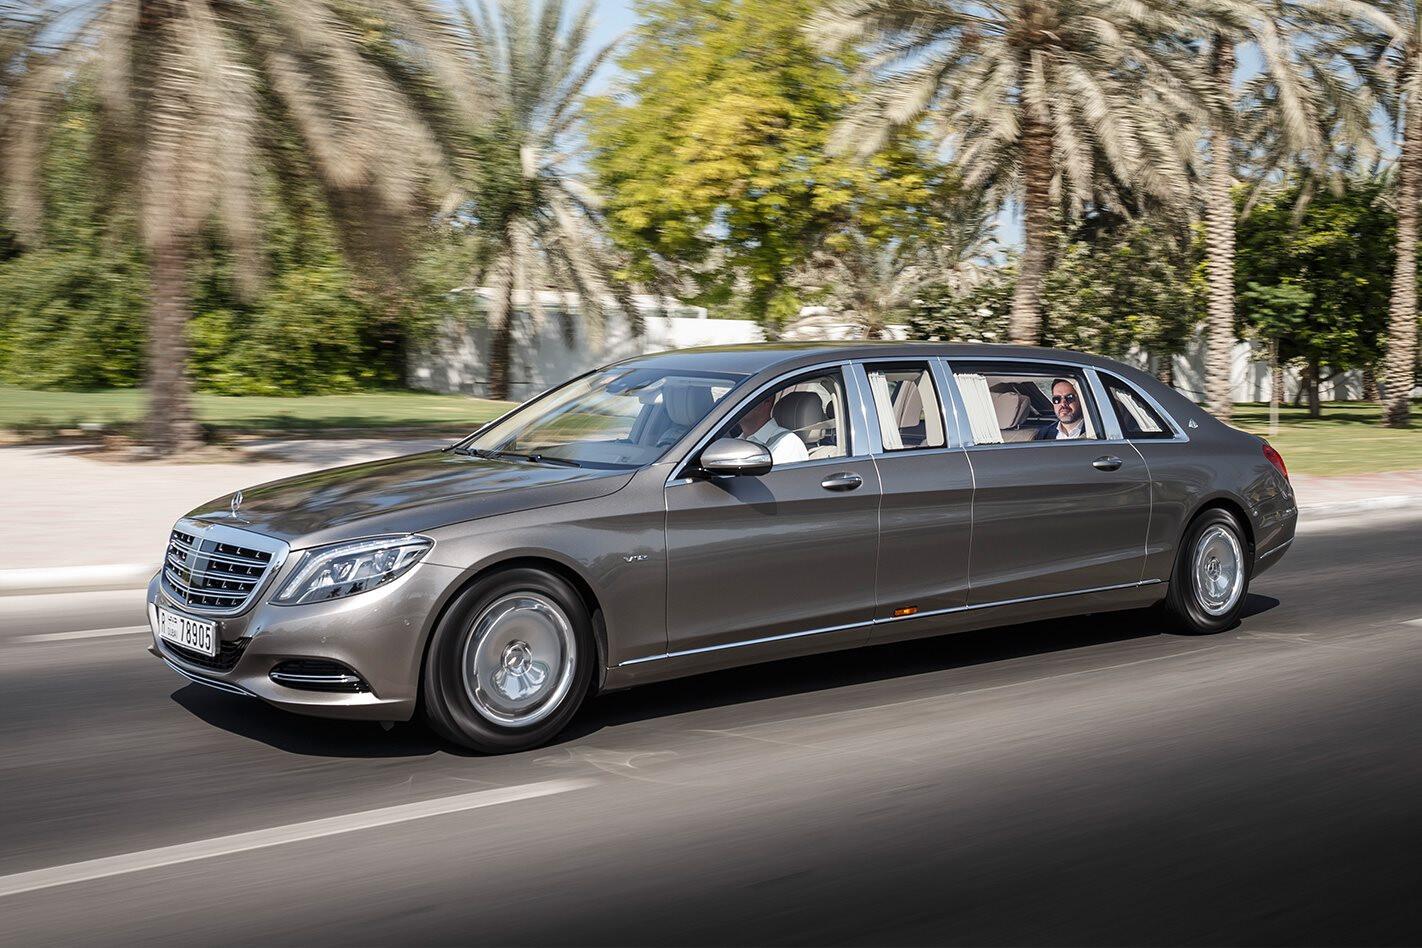 2017 Mercedes-Maybach Pullman S600 - The Shabby Sheikh